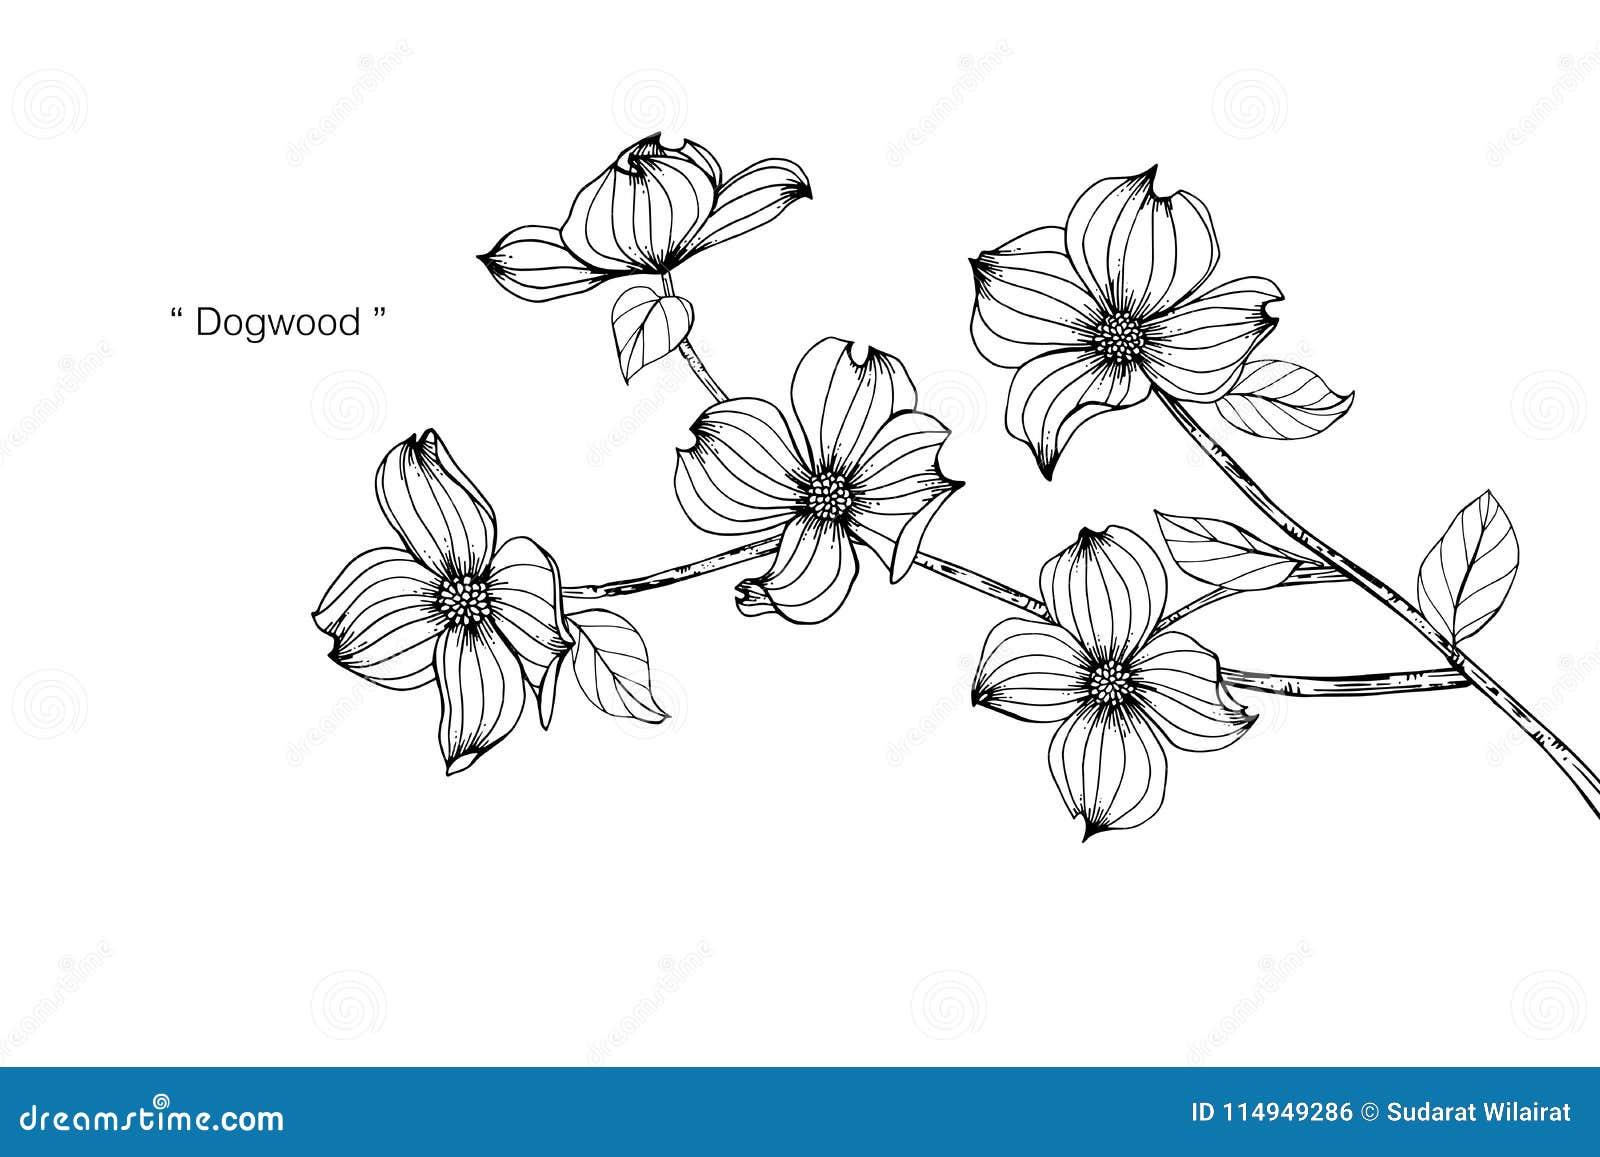 Dogwood flower drawing illustration black and white with line art dogwood flower drawing illustration black and white with line art on white backgrounds mightylinksfo